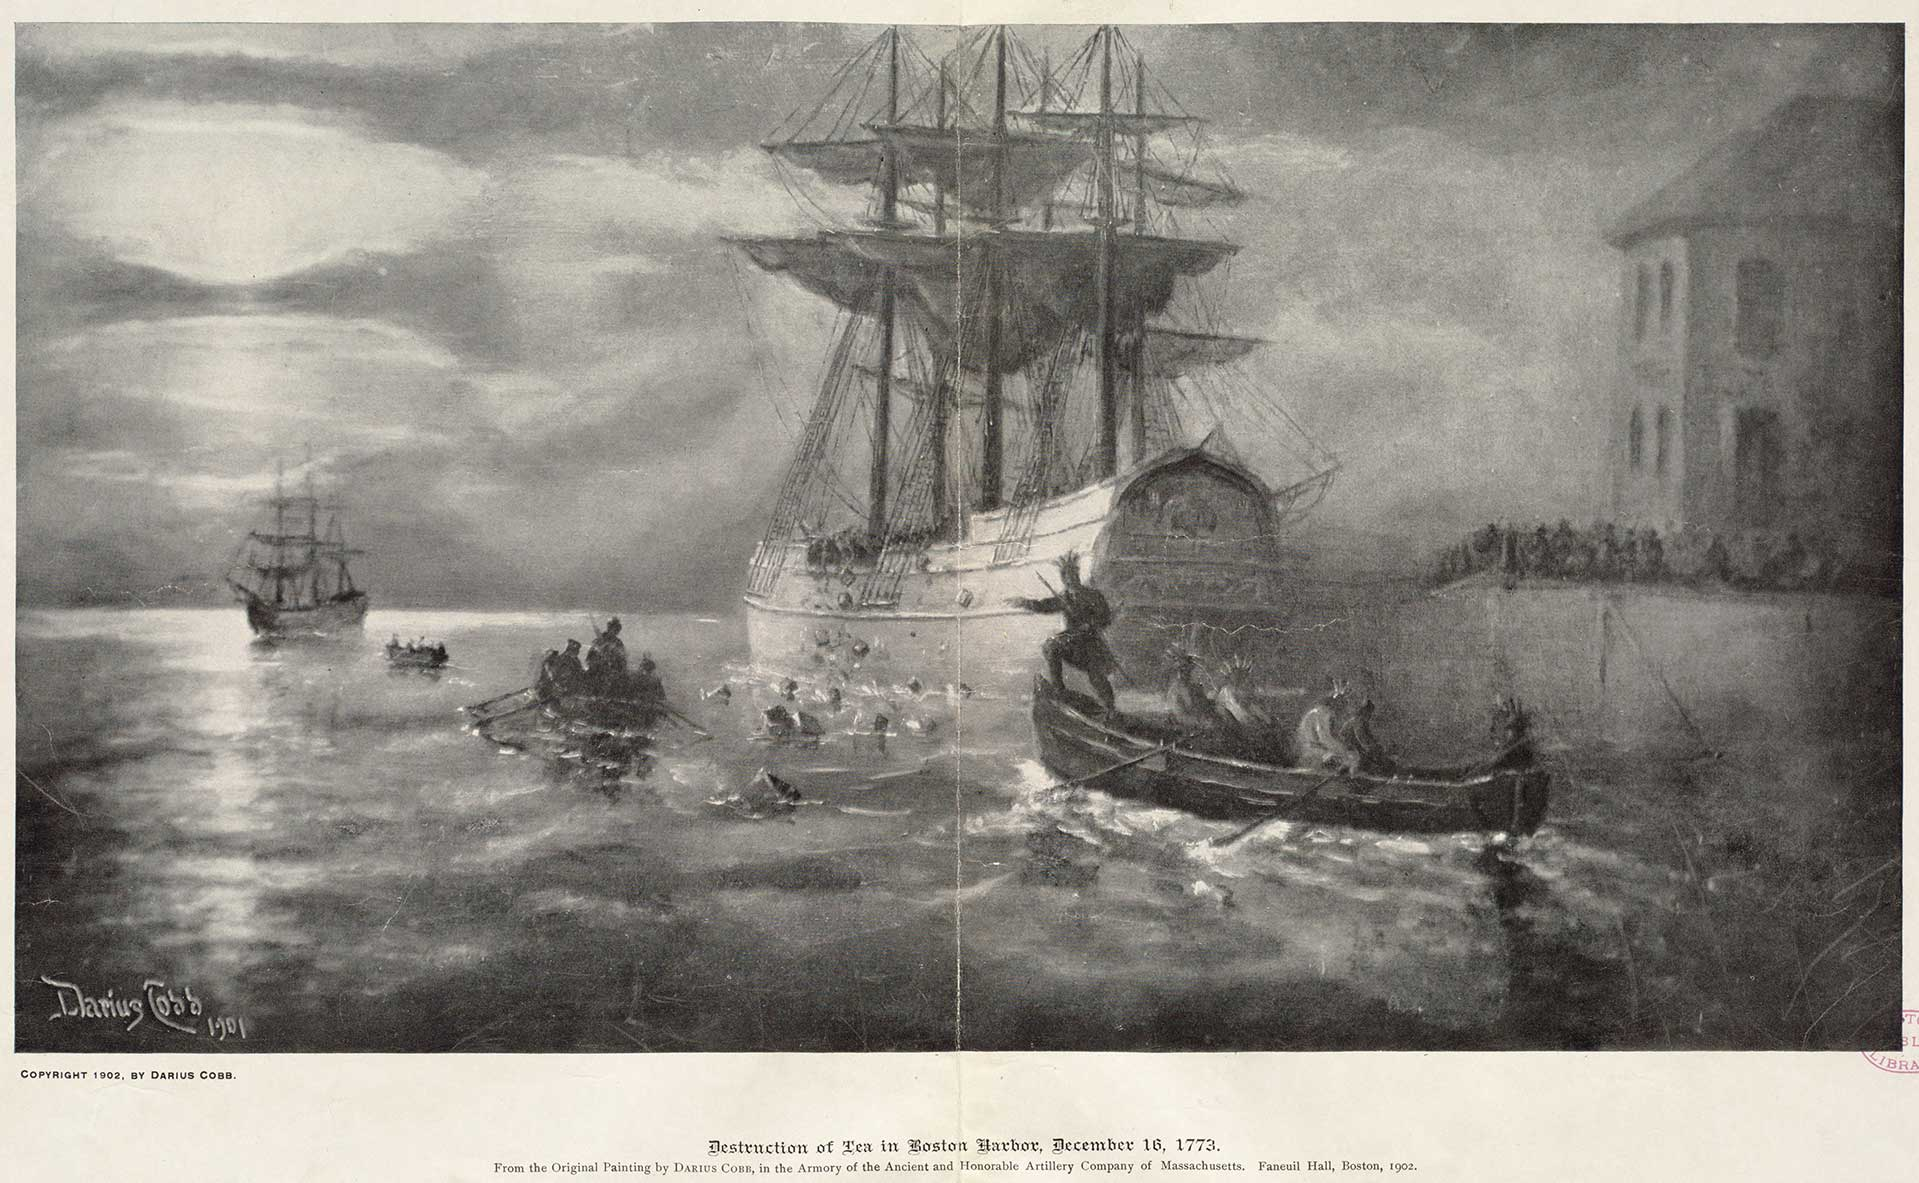 destruction of the tea in the boston harbor